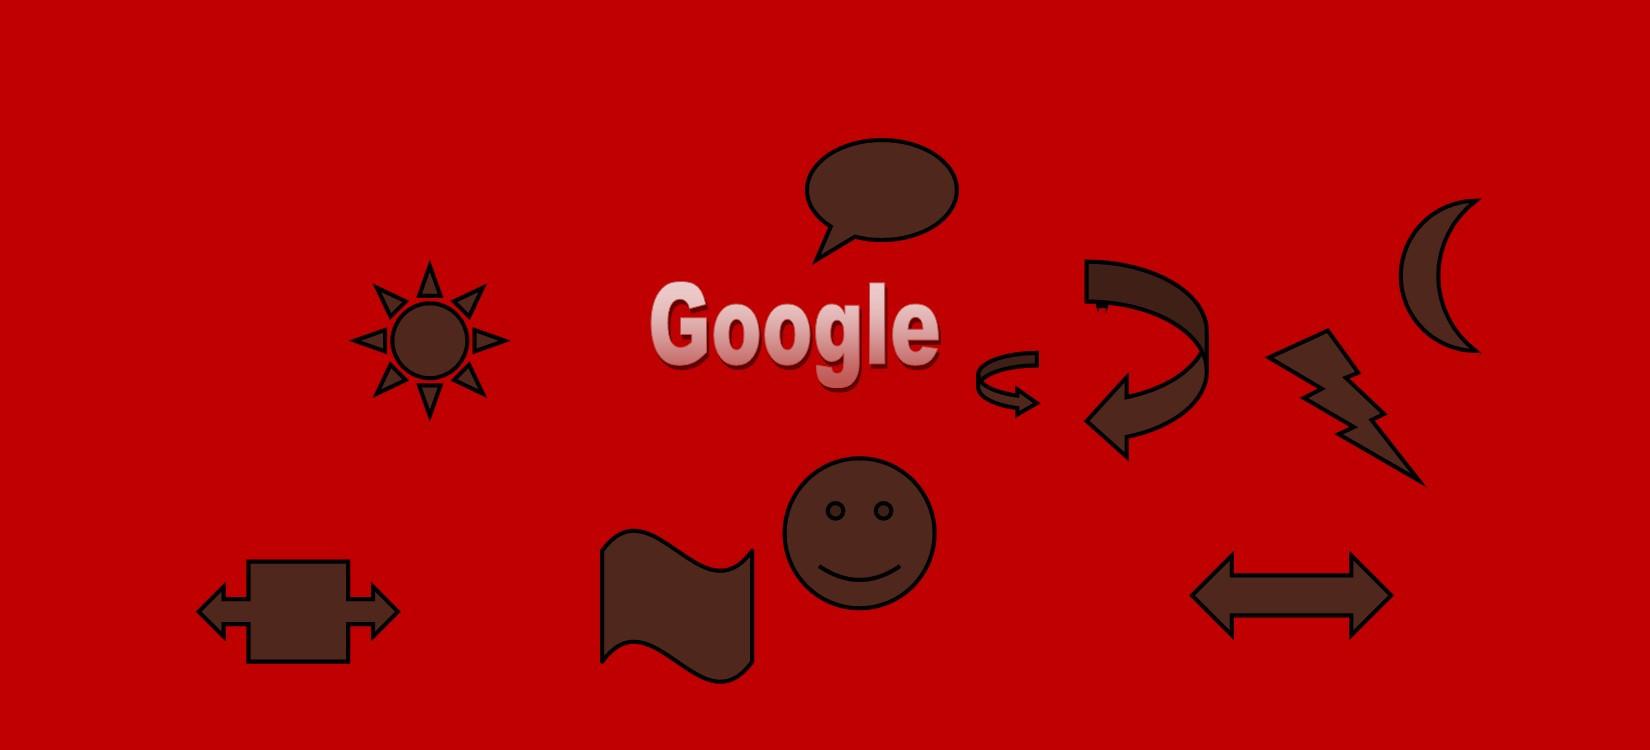 l google.jpg